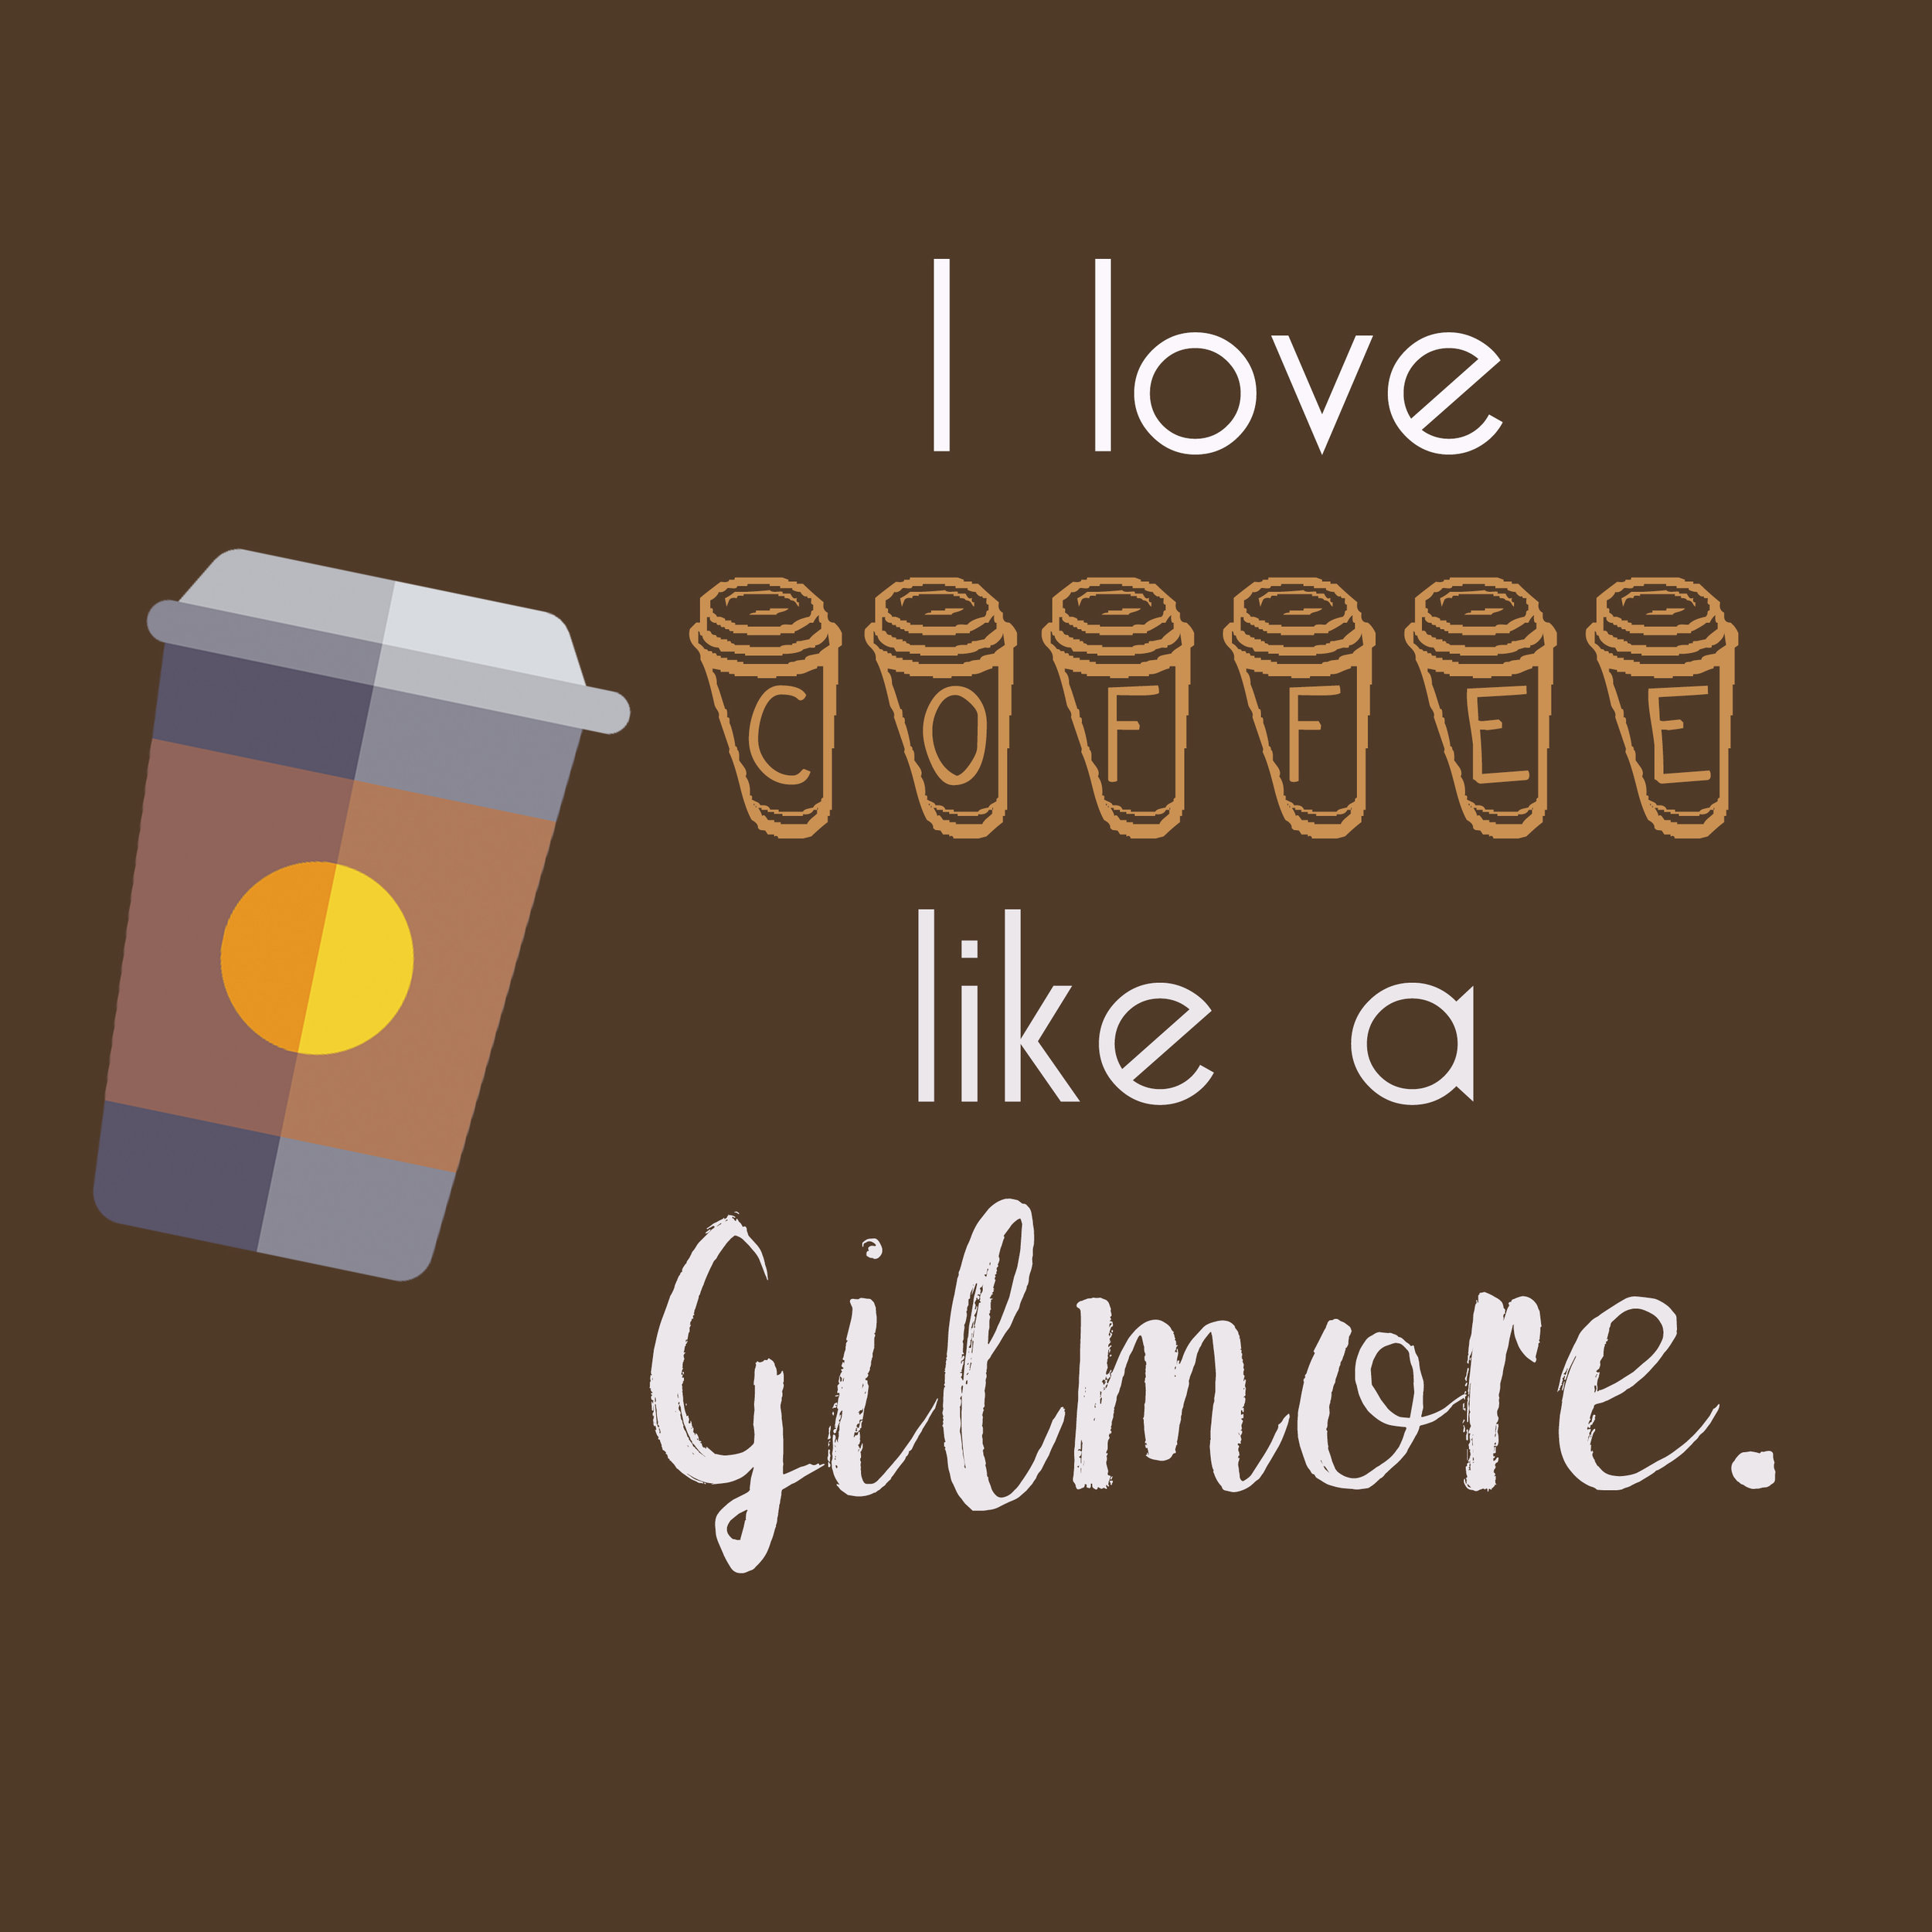 Gilmore Coffee.jpg